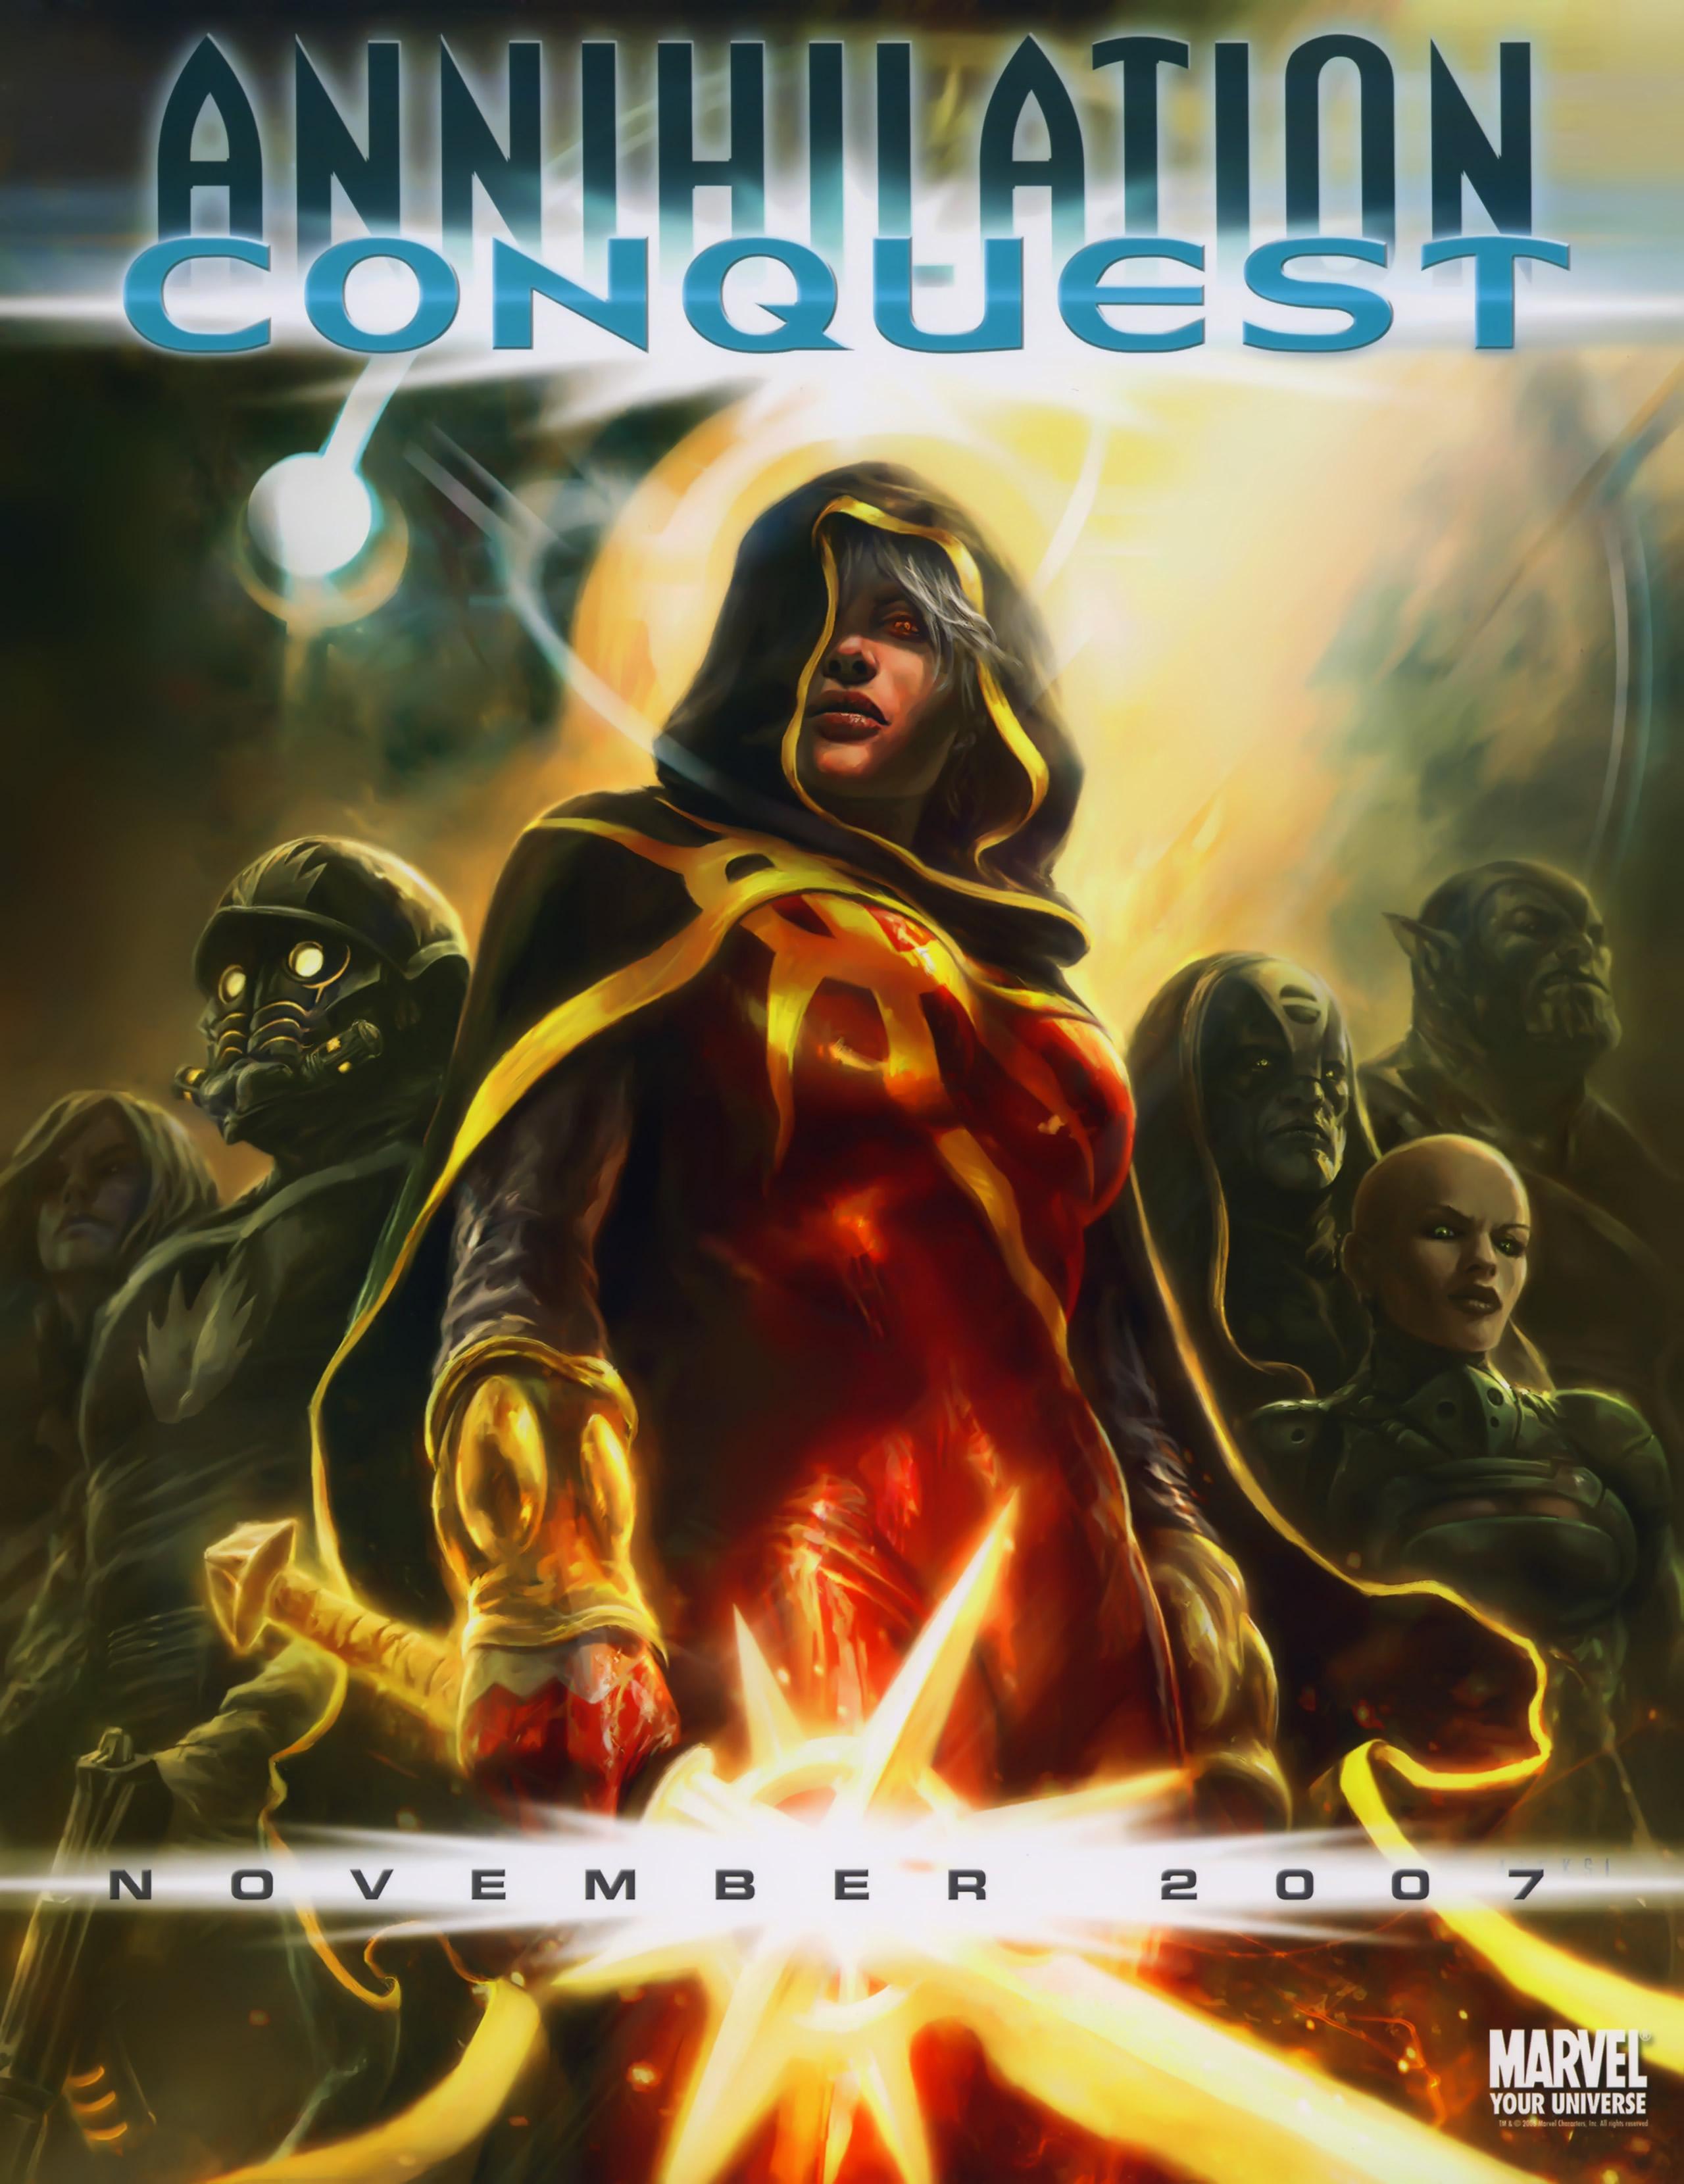 Annihilation: Conquest